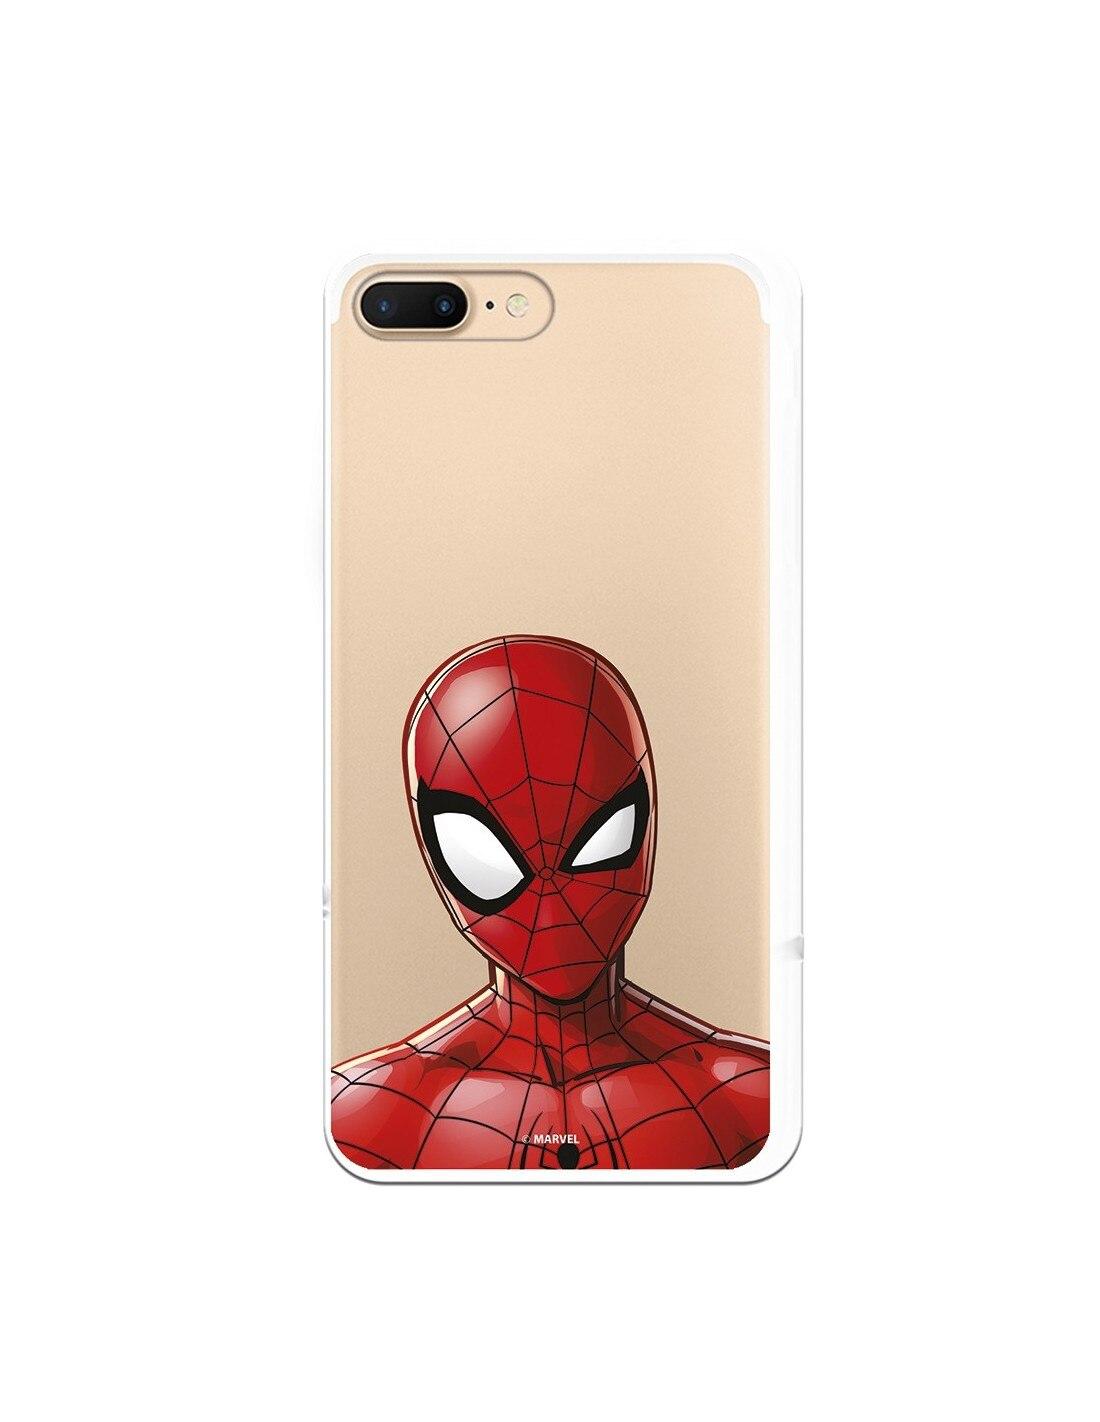 Marvel spiderman oficial iphone 7 plus caso silhueta clara-marvel